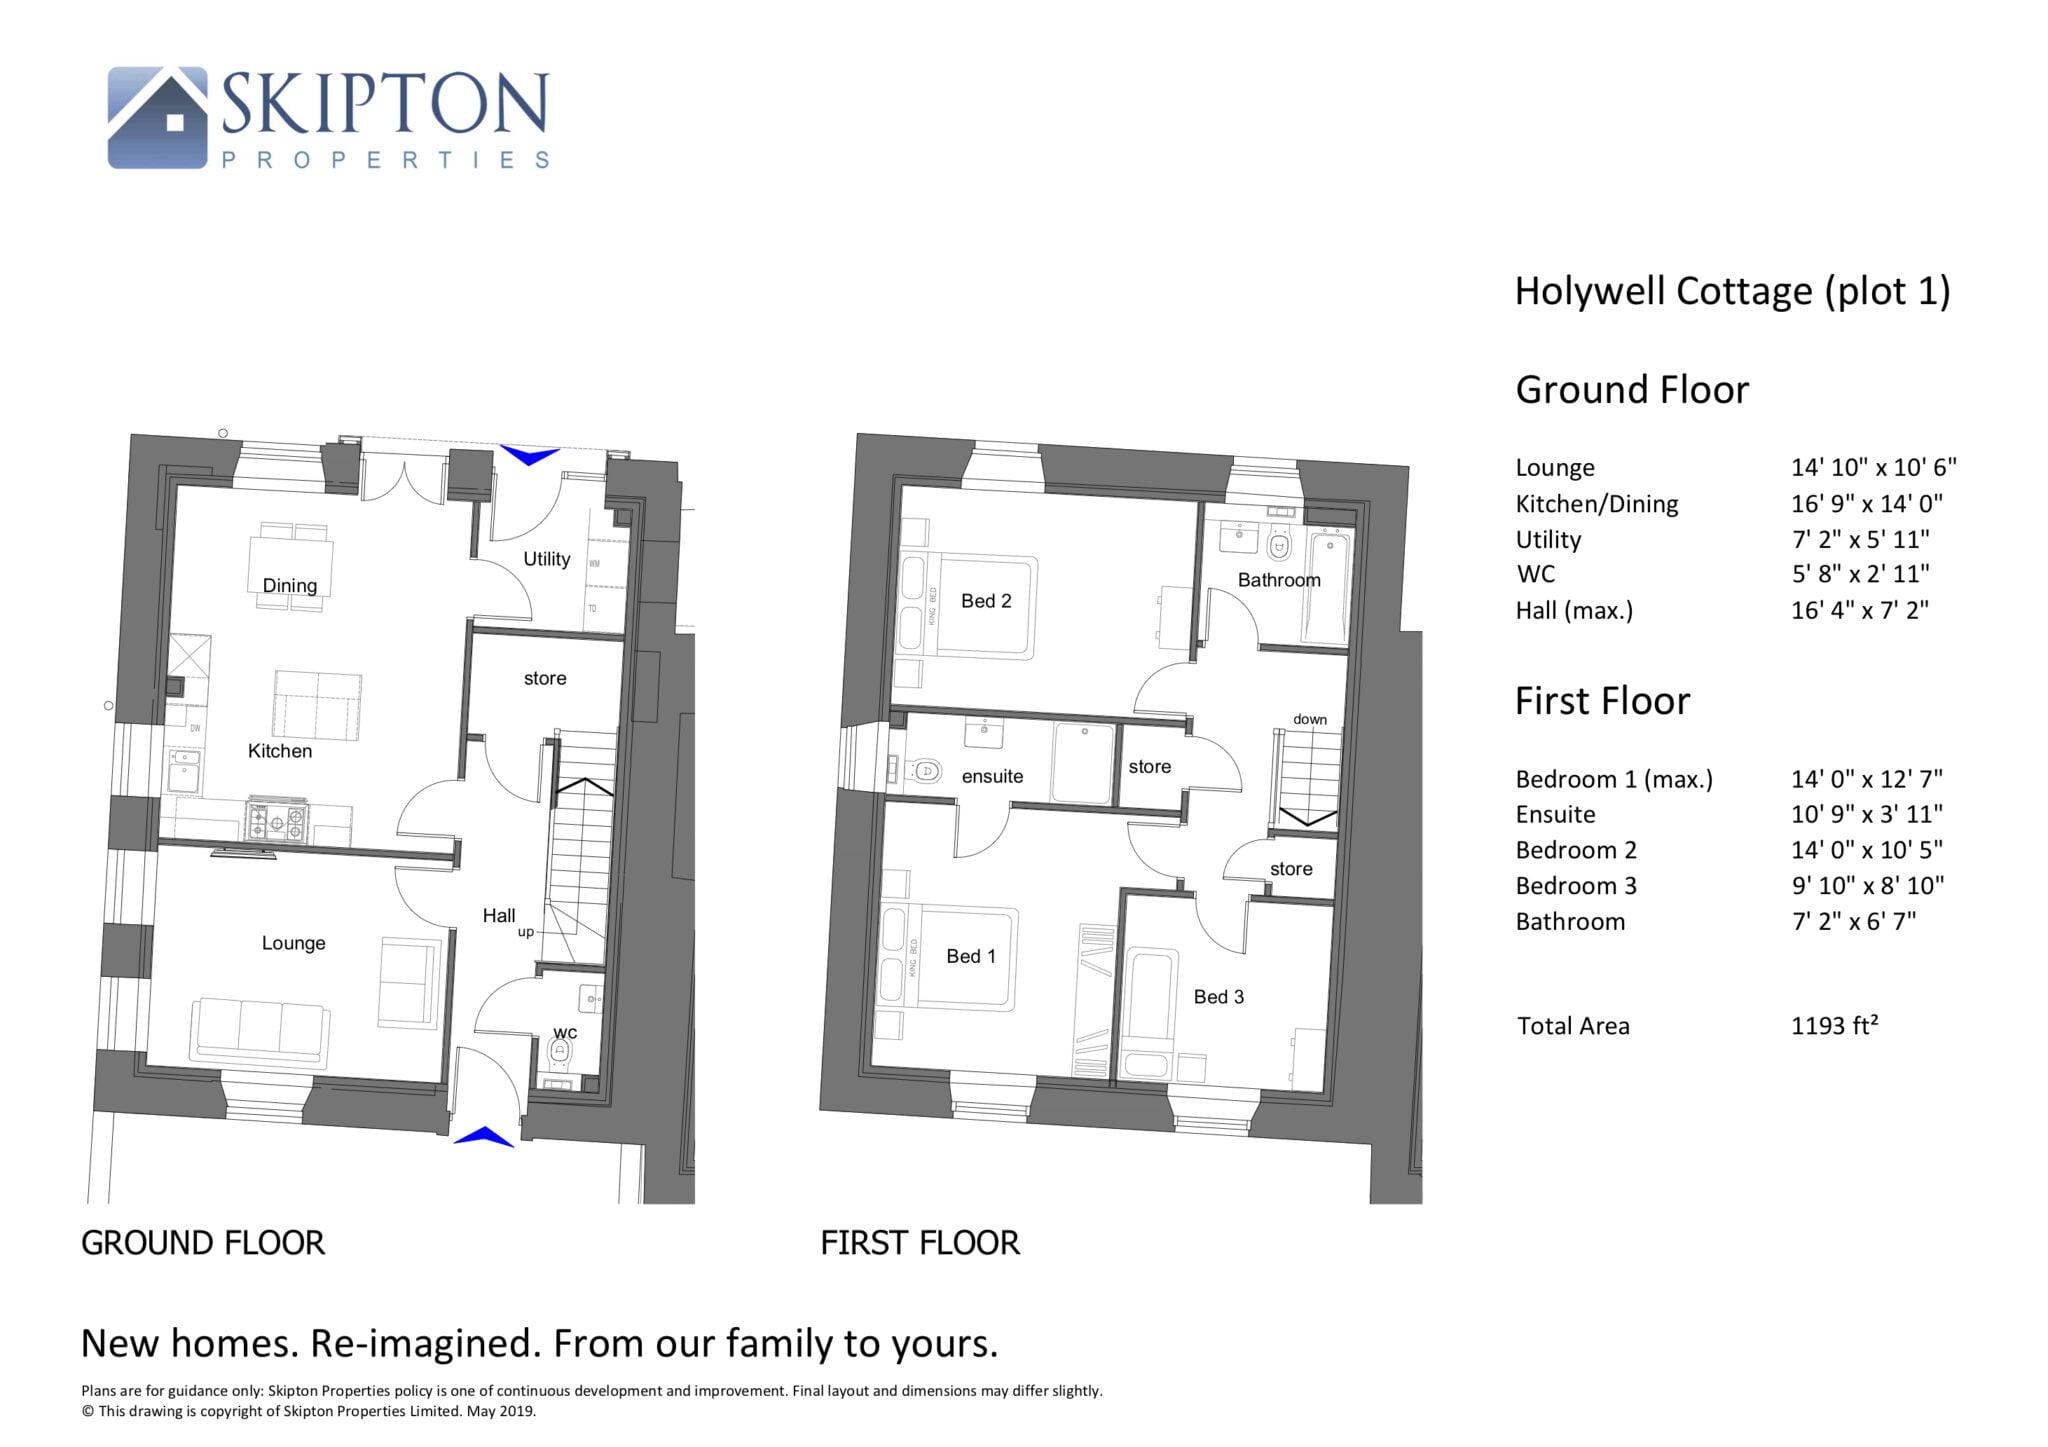 Holywell Cottage Floor Plan